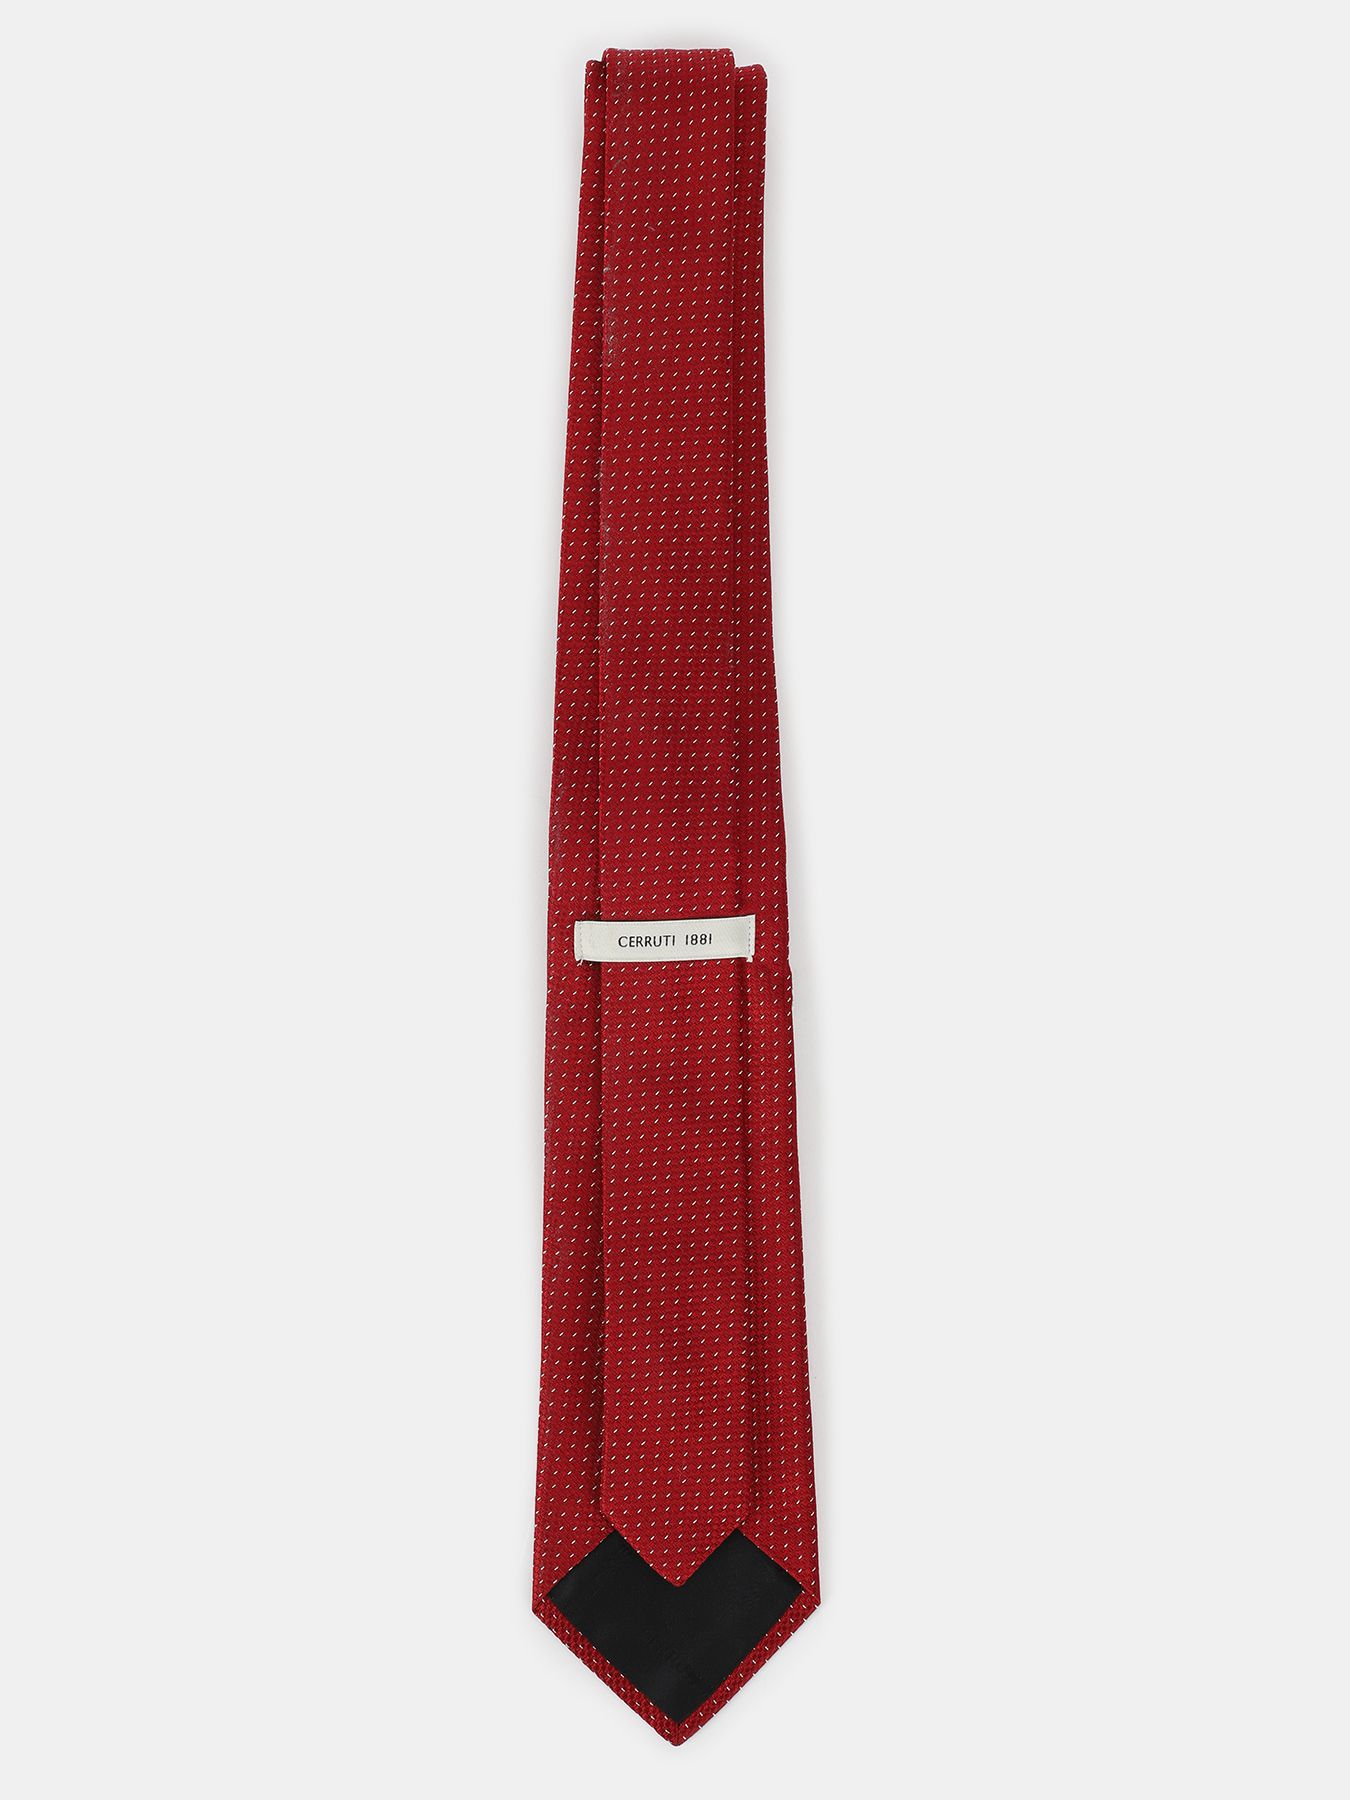 Галстук Cerruti 1881 Галстук галстук romon 3n40302